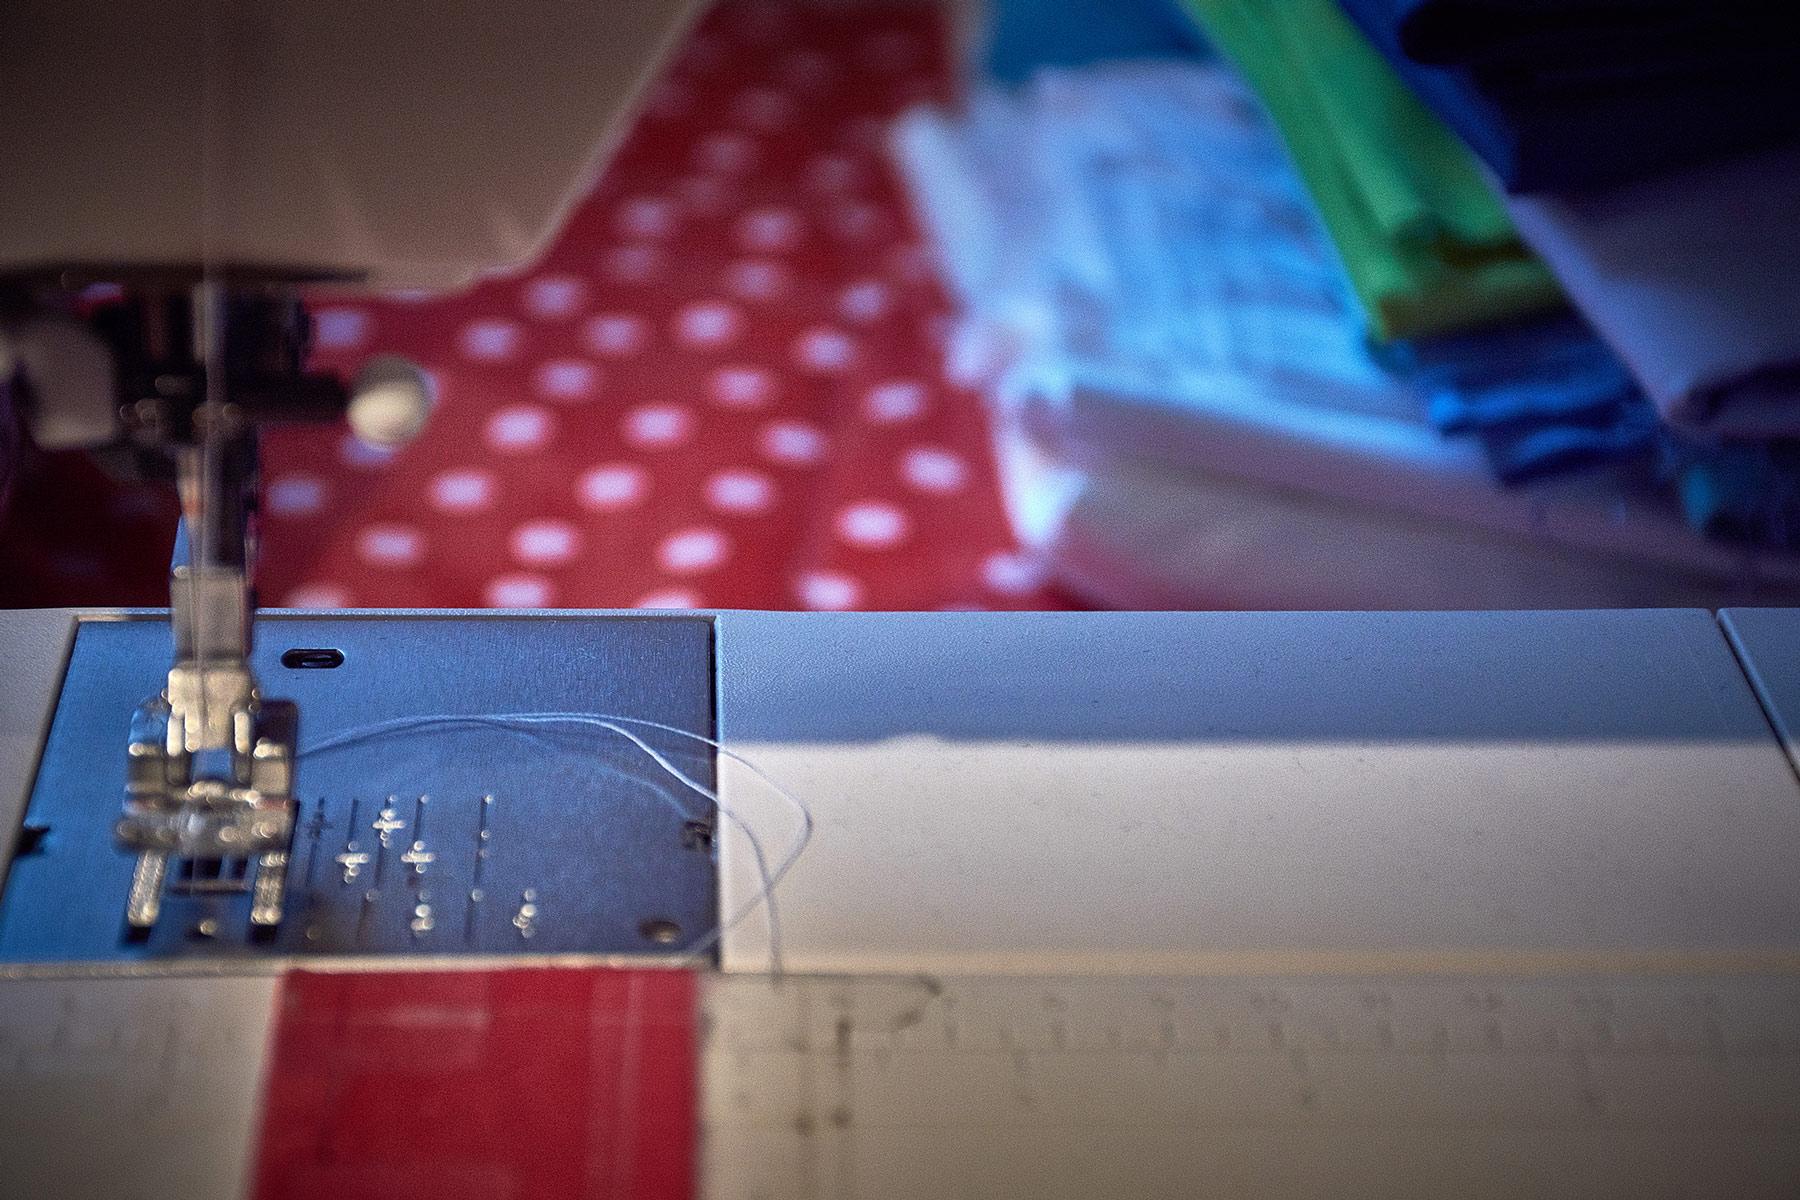 Sewing_machine_workhorse.jpg